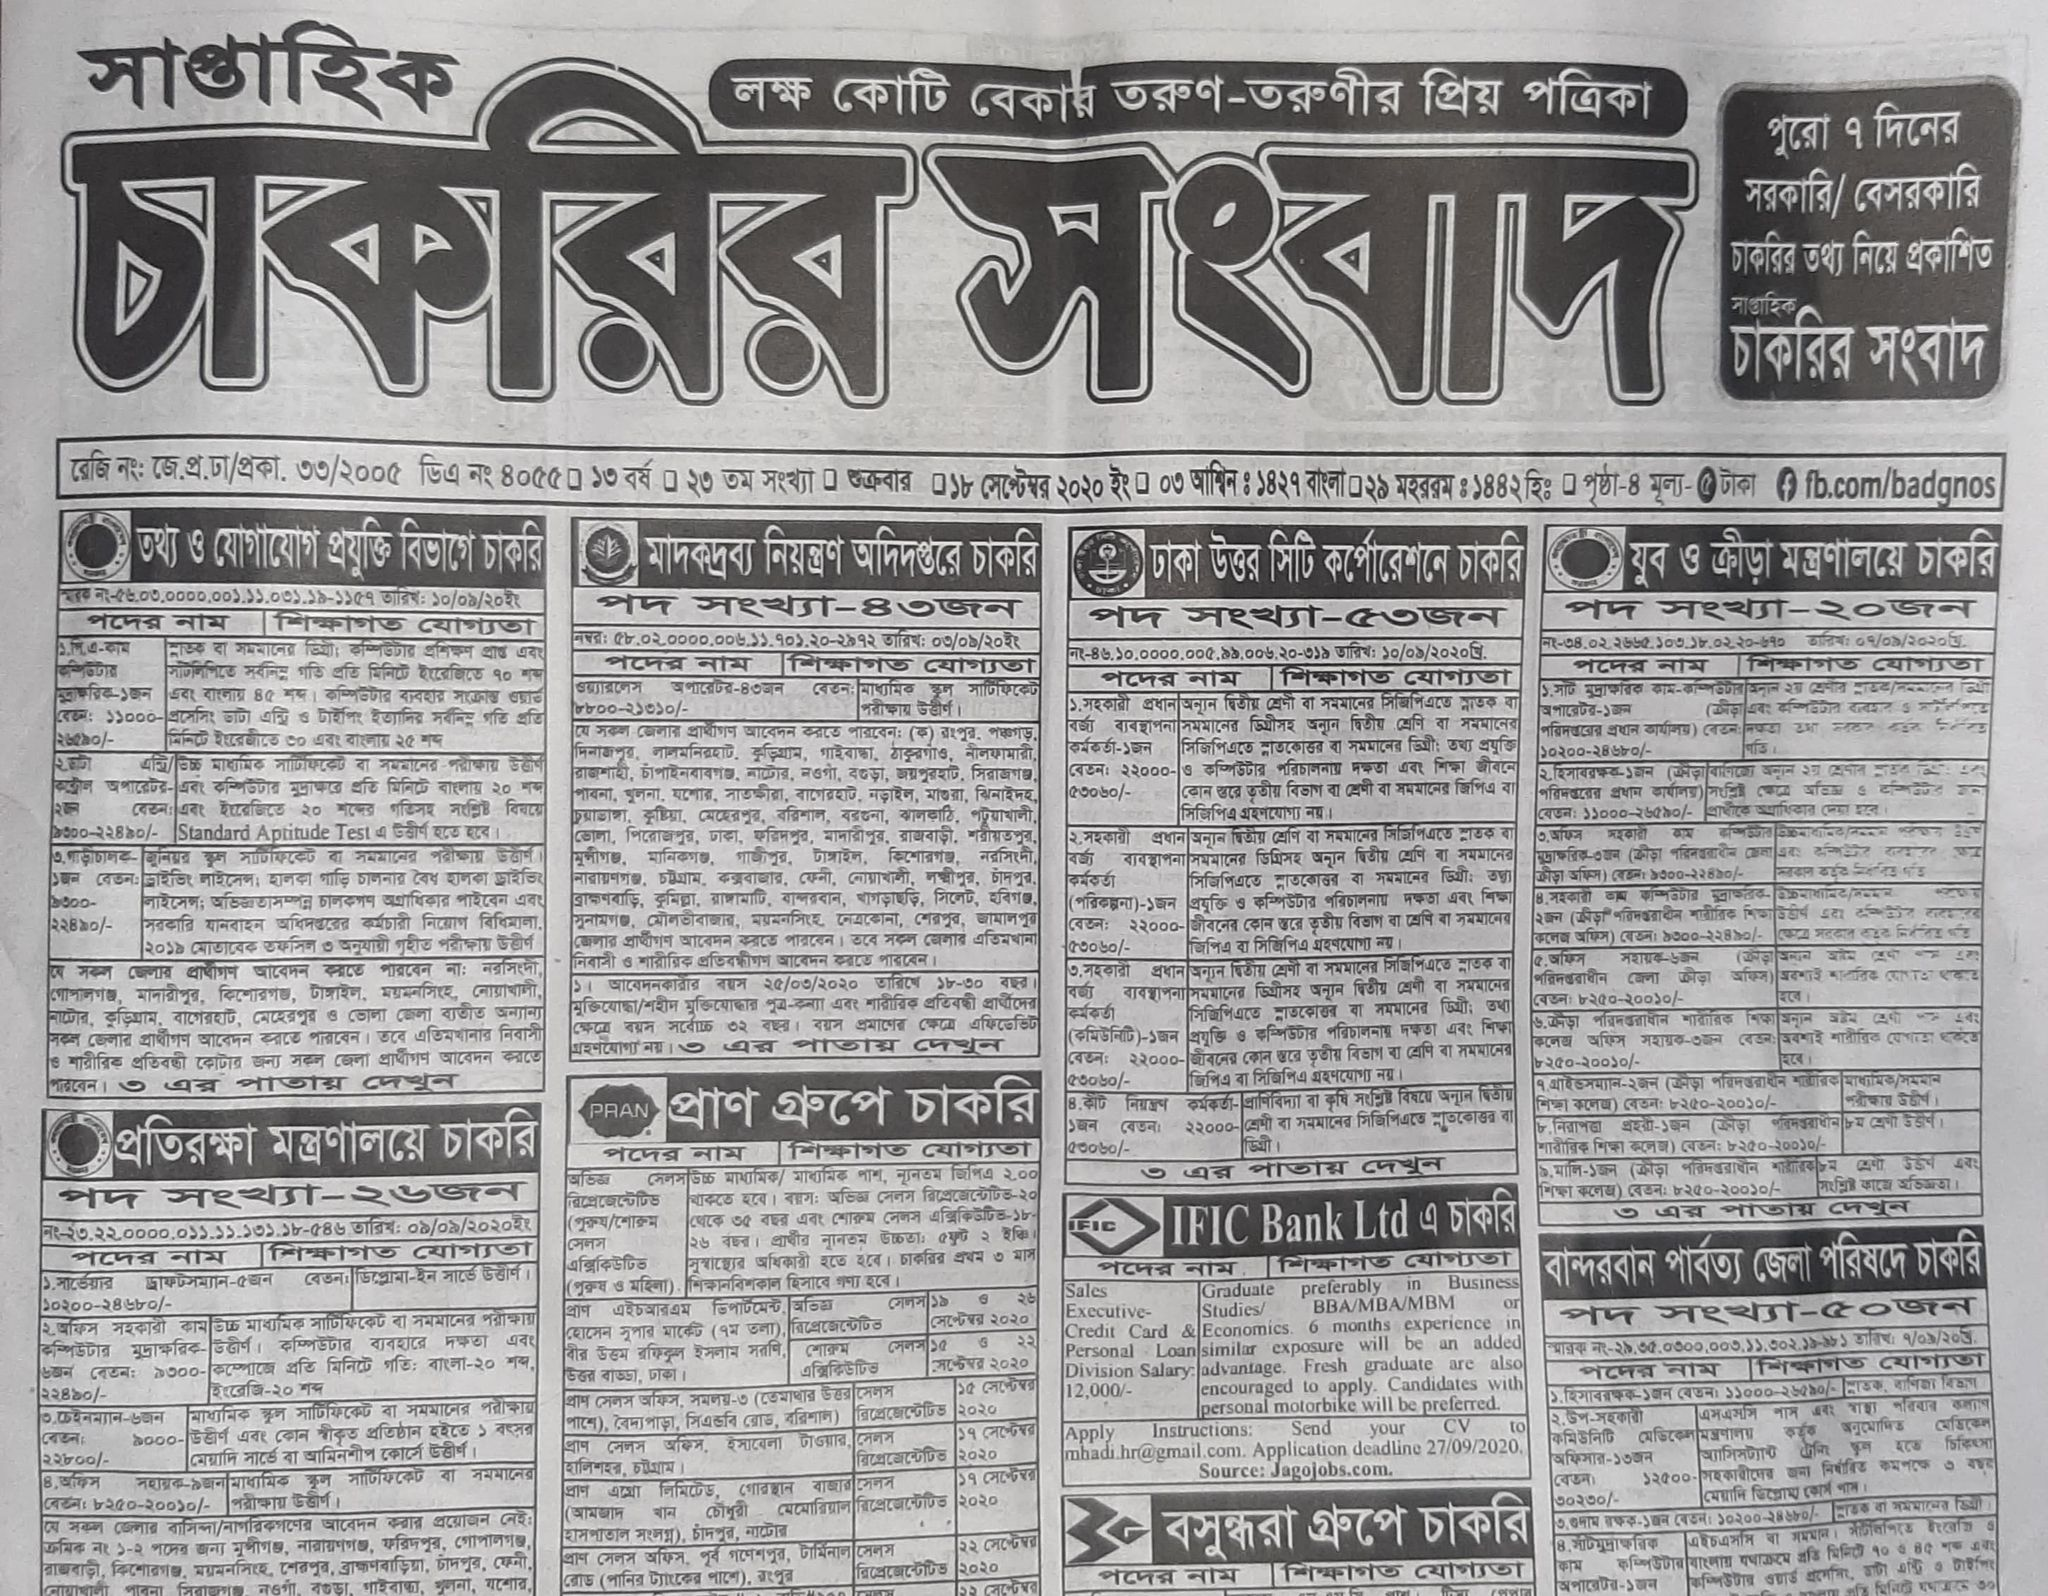 Saptahik Chakrir songbad Newspaper 18 September 2020 সাপ্তাহিক চাকরির সংবাদ পত্রিকা ১৮ সেপ্টেম্বর ২০২০ Pdf Download